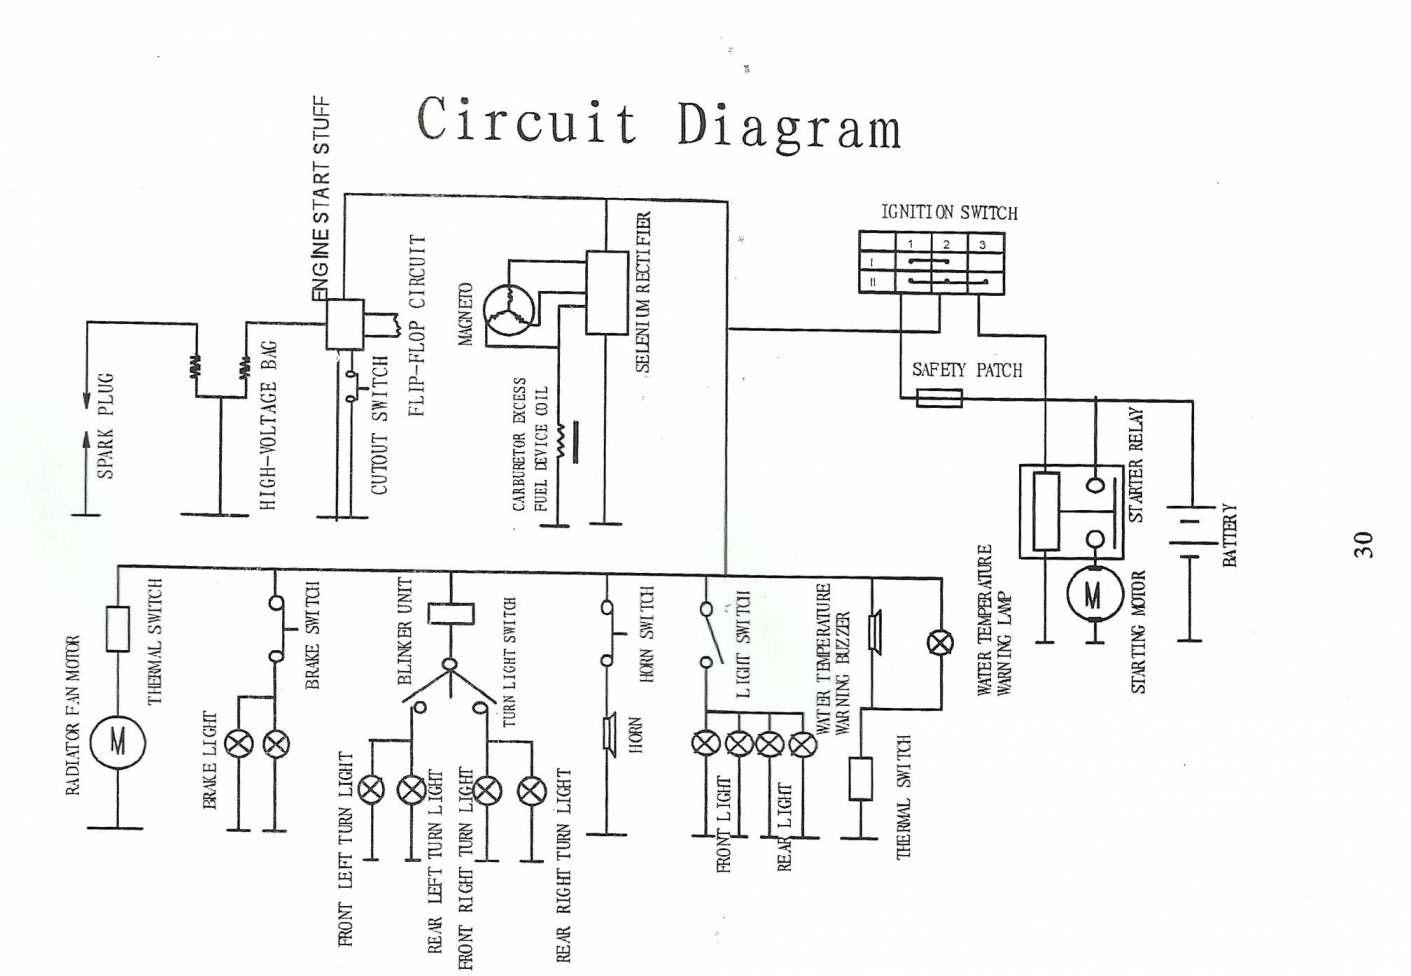 15 Delphi Pa66 Wiring Diagram Electrical Wiring Diagram Diagram Delphi